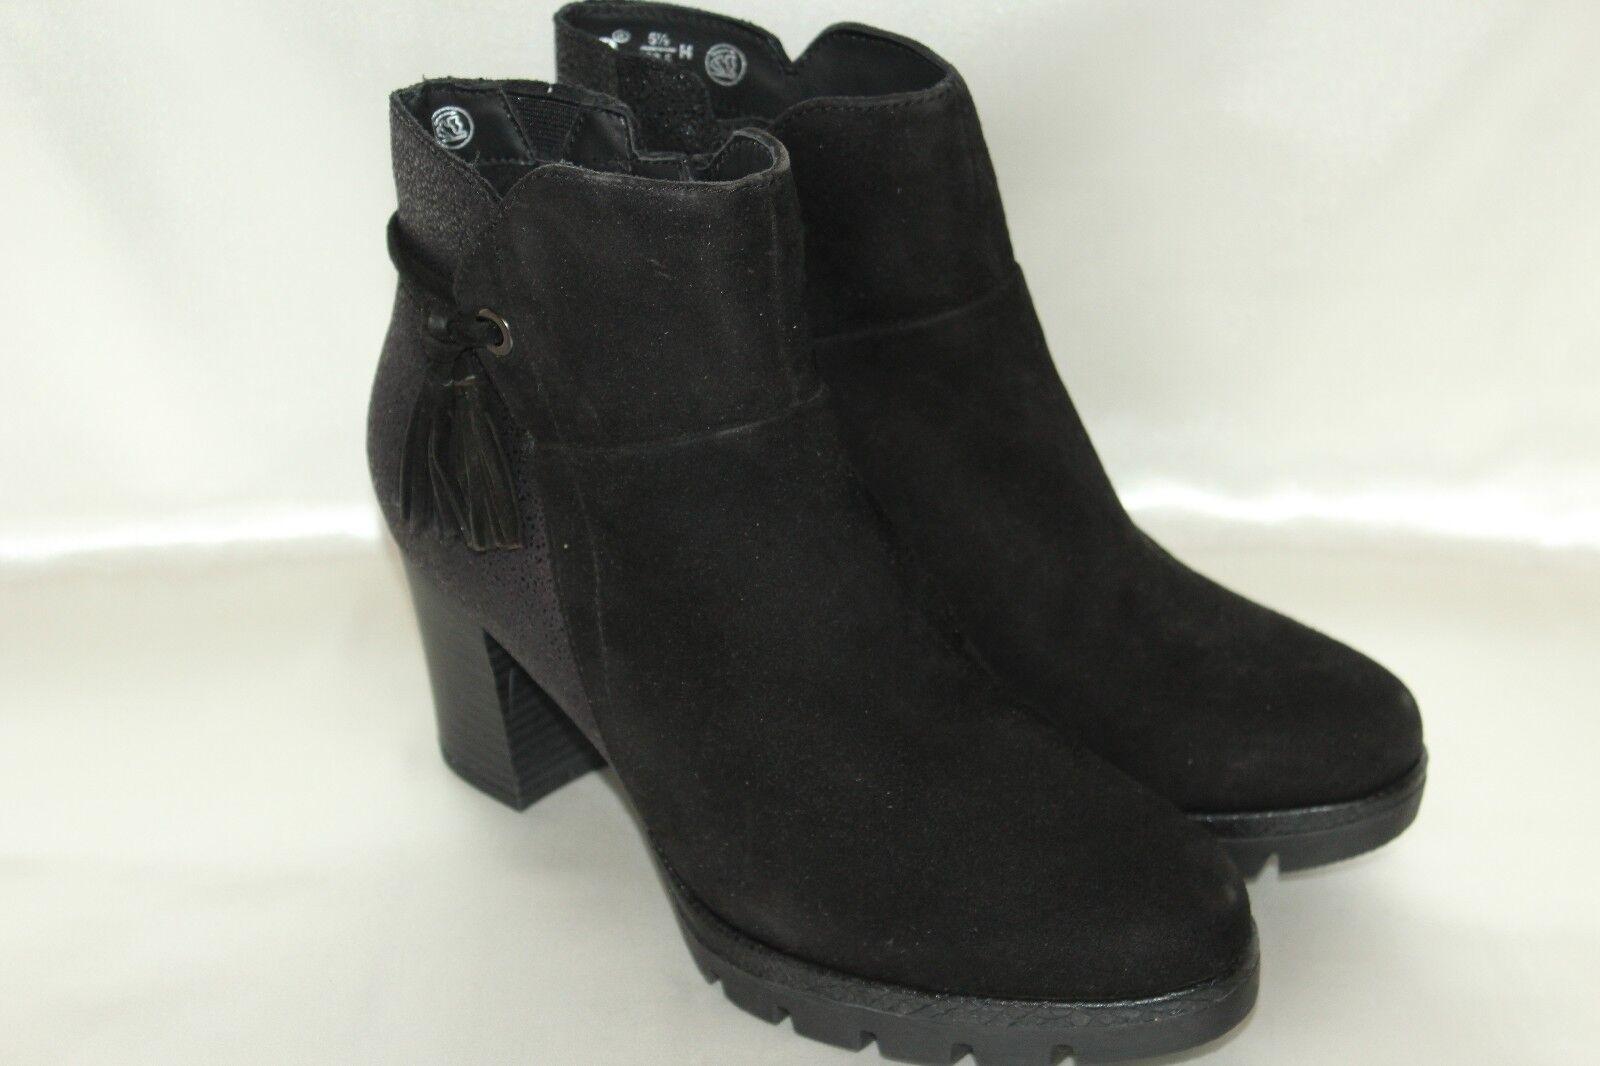 NEW  NIB  JANA Black Suede Leather Comfort Zip Ankle Boots Sz EU38.5 Wide  170